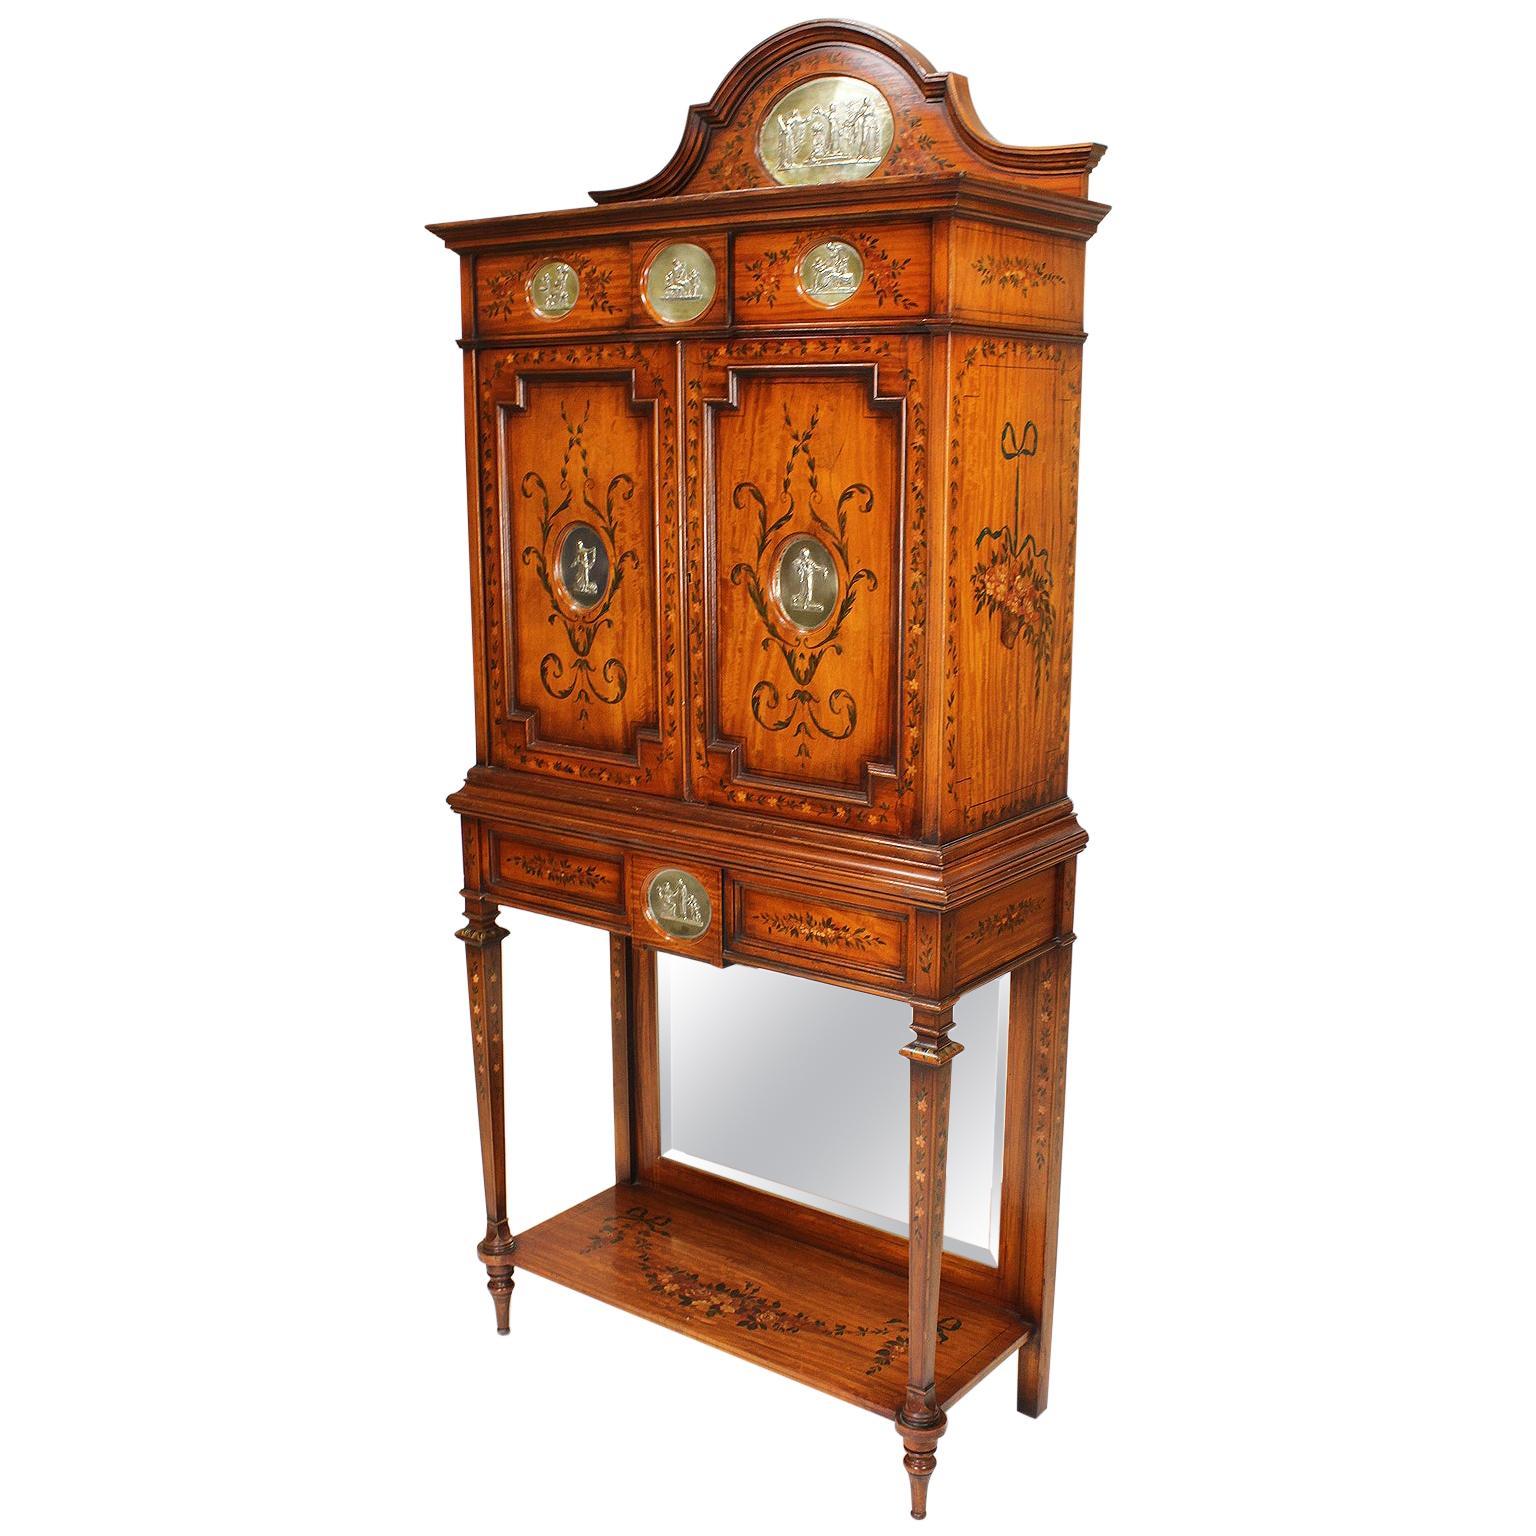 English 19th Century Edwardian Style Painted Satinwood & Silver-Mounted Cabinet